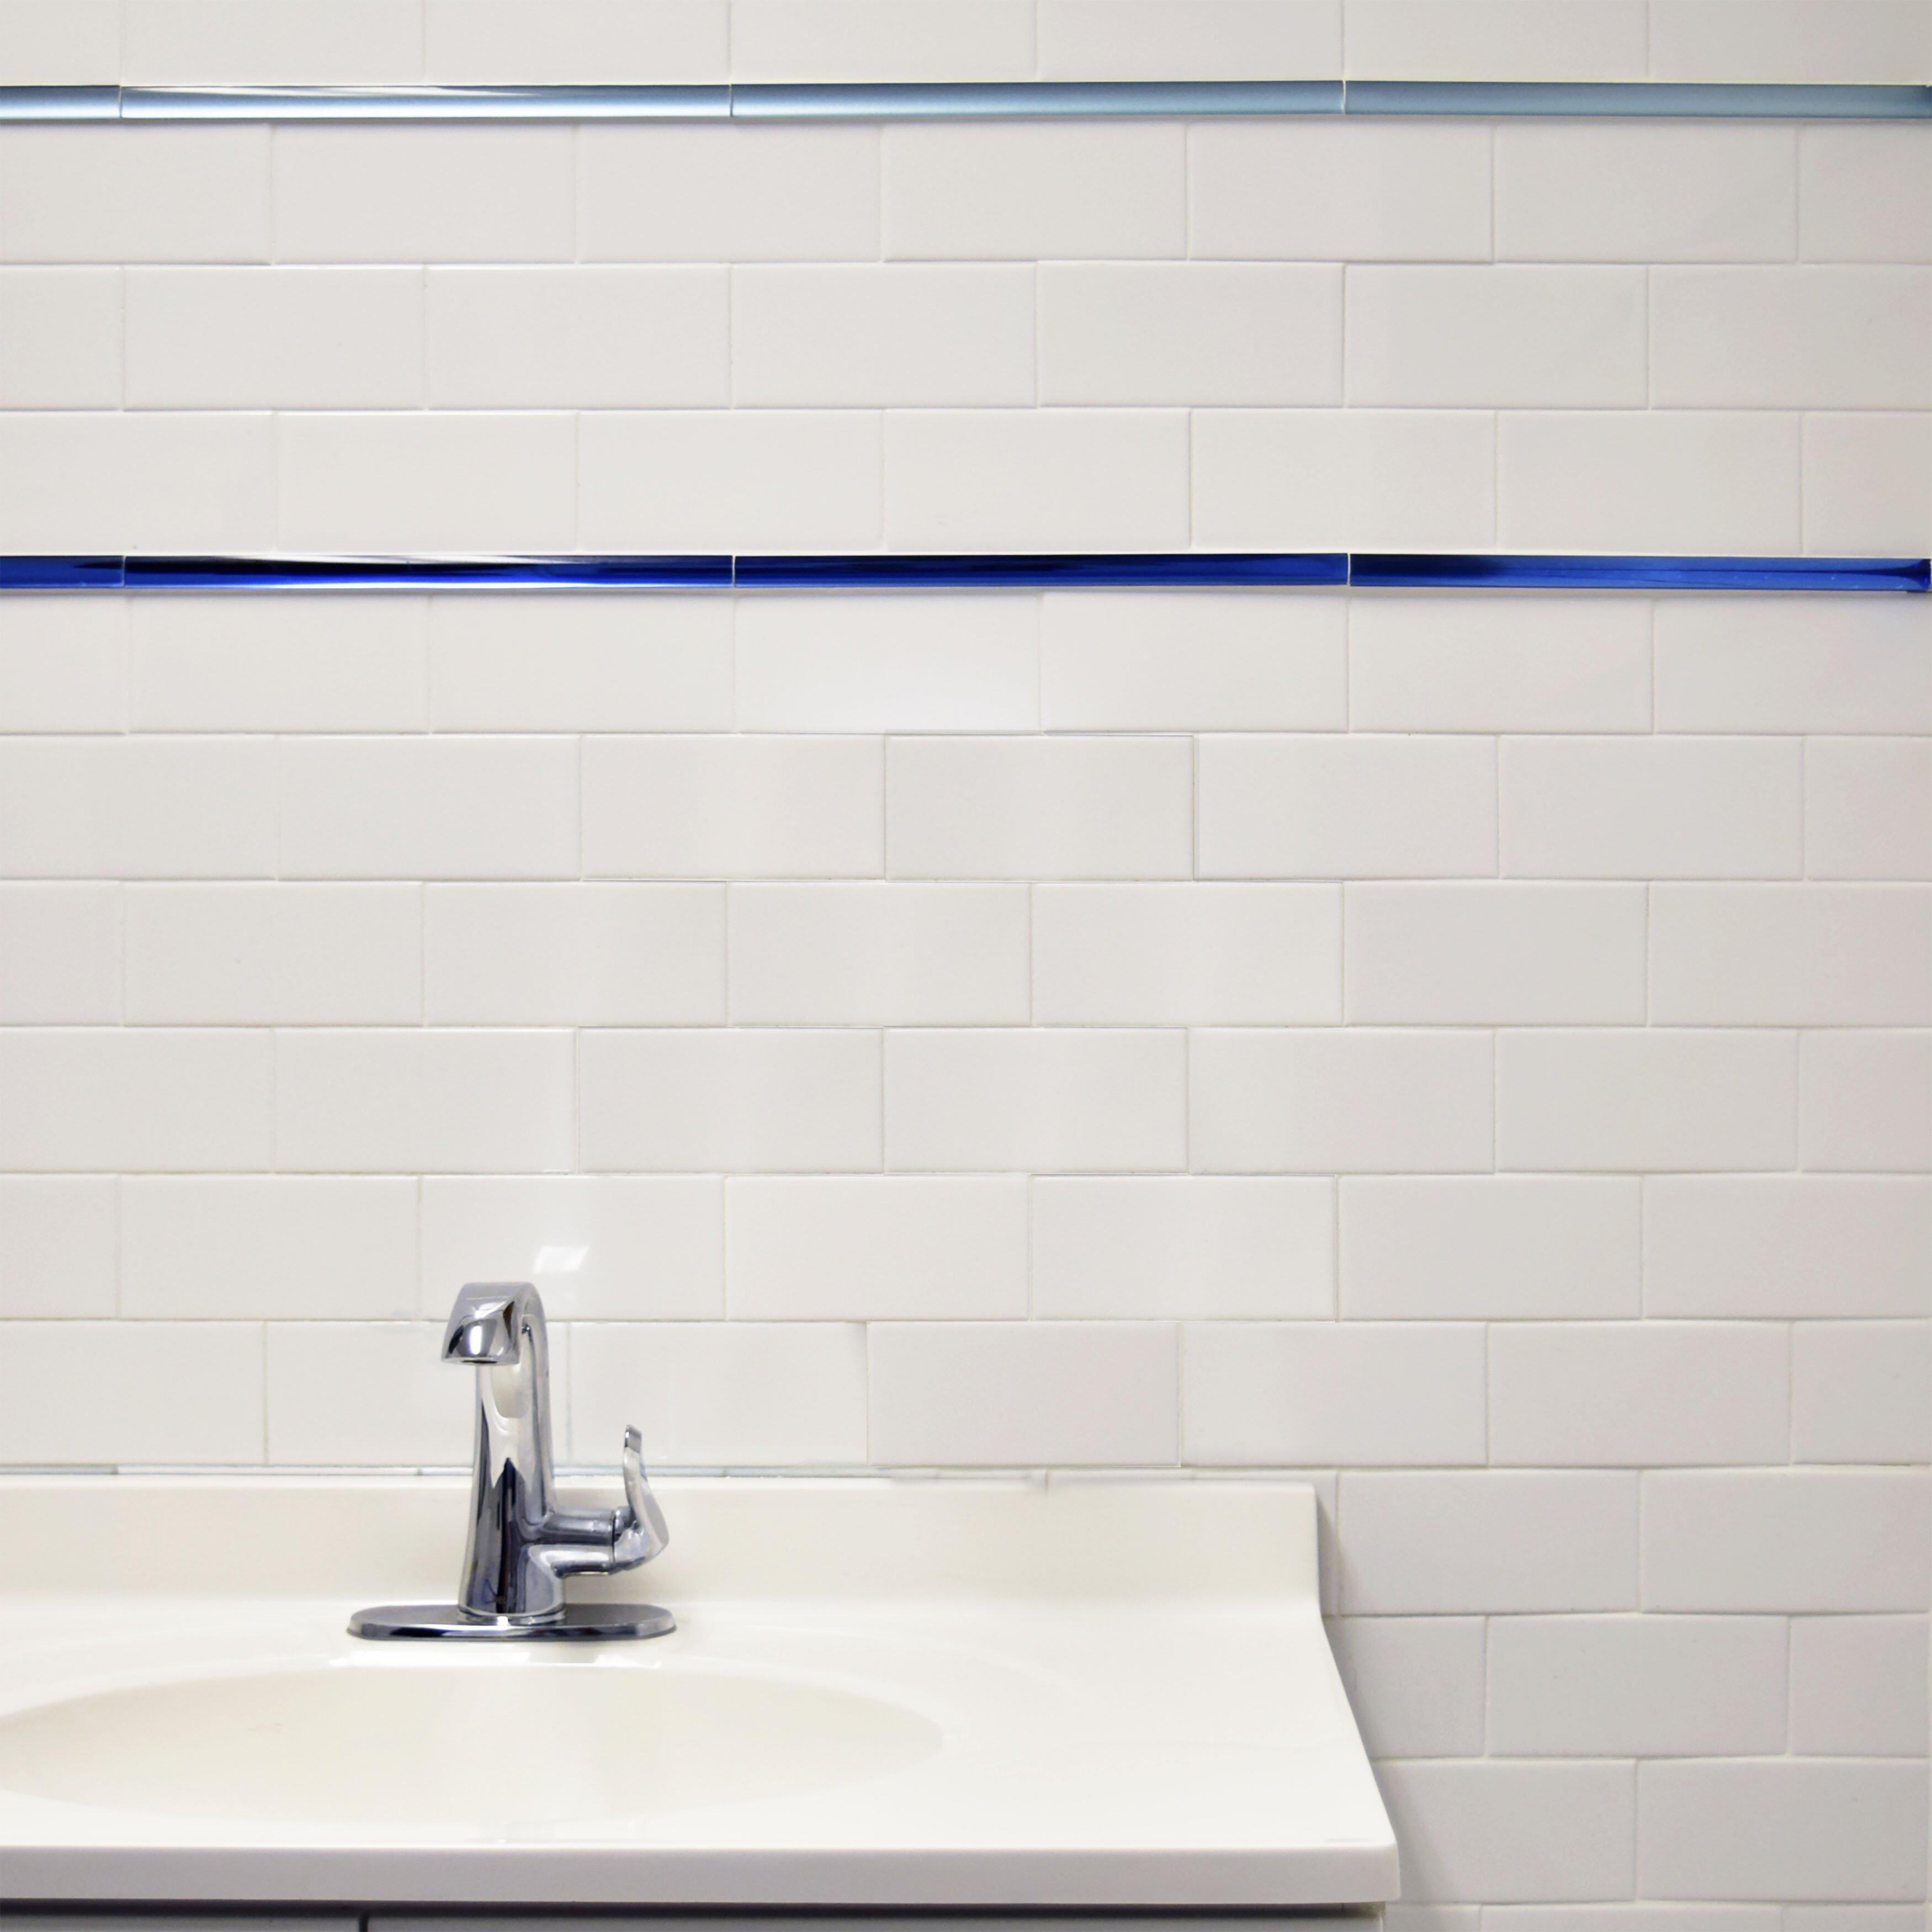 Elitetile Prospect 3 X 6 Ceramic Subway Tile In Glazed White Reviews Wayfair